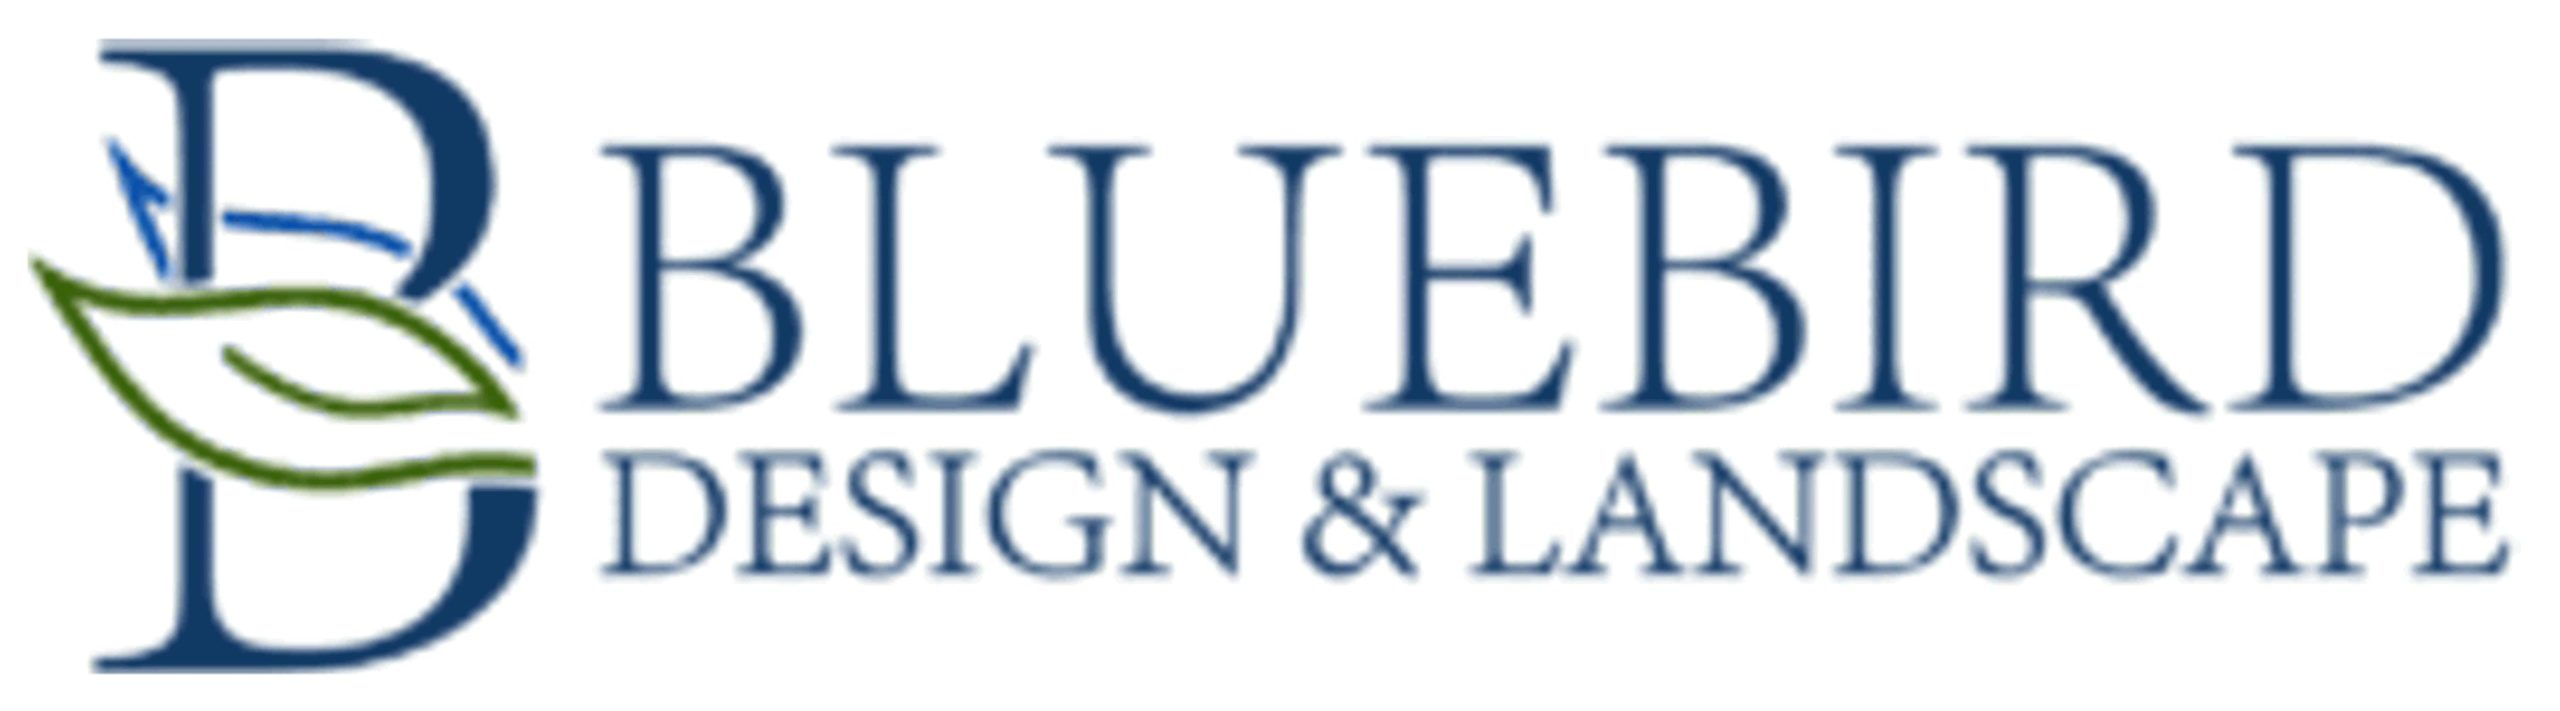 Bluebird Design & Landscape Logo